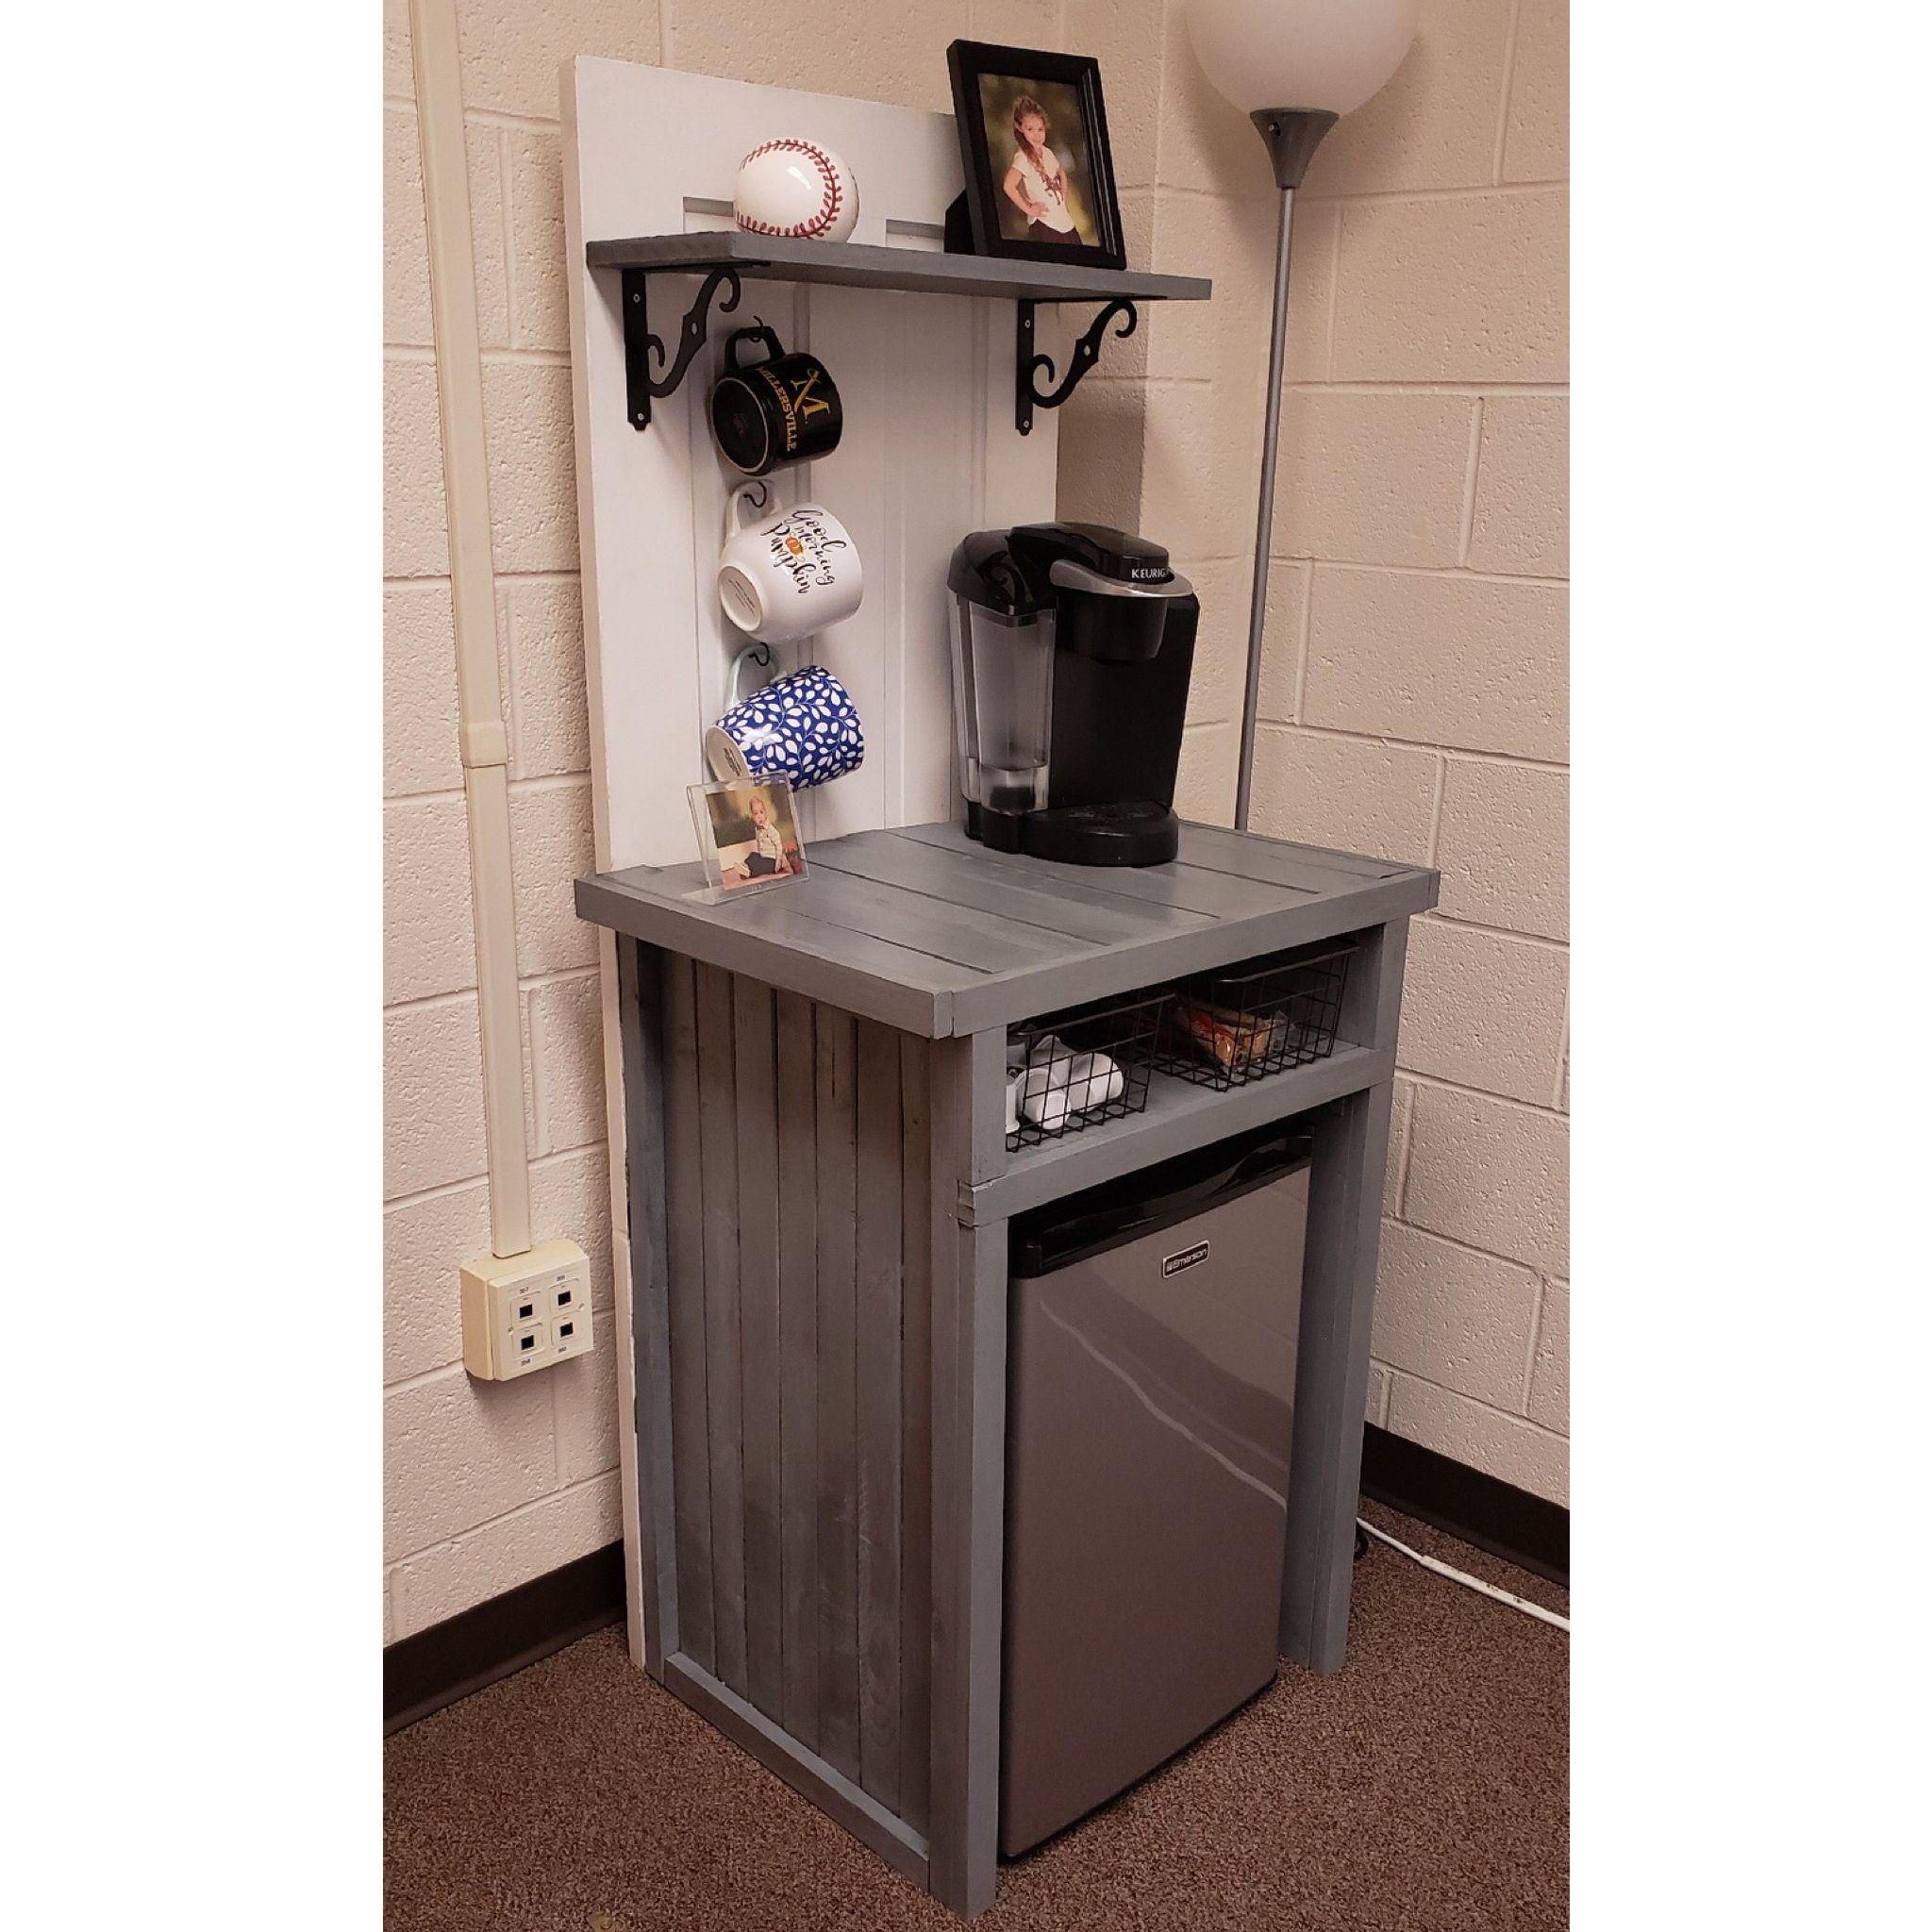 Diy Woodworking Project Diy Coffee Bar Coffee Bar Station Mini Fridge Cabinet Rustic Furniture See H Mini